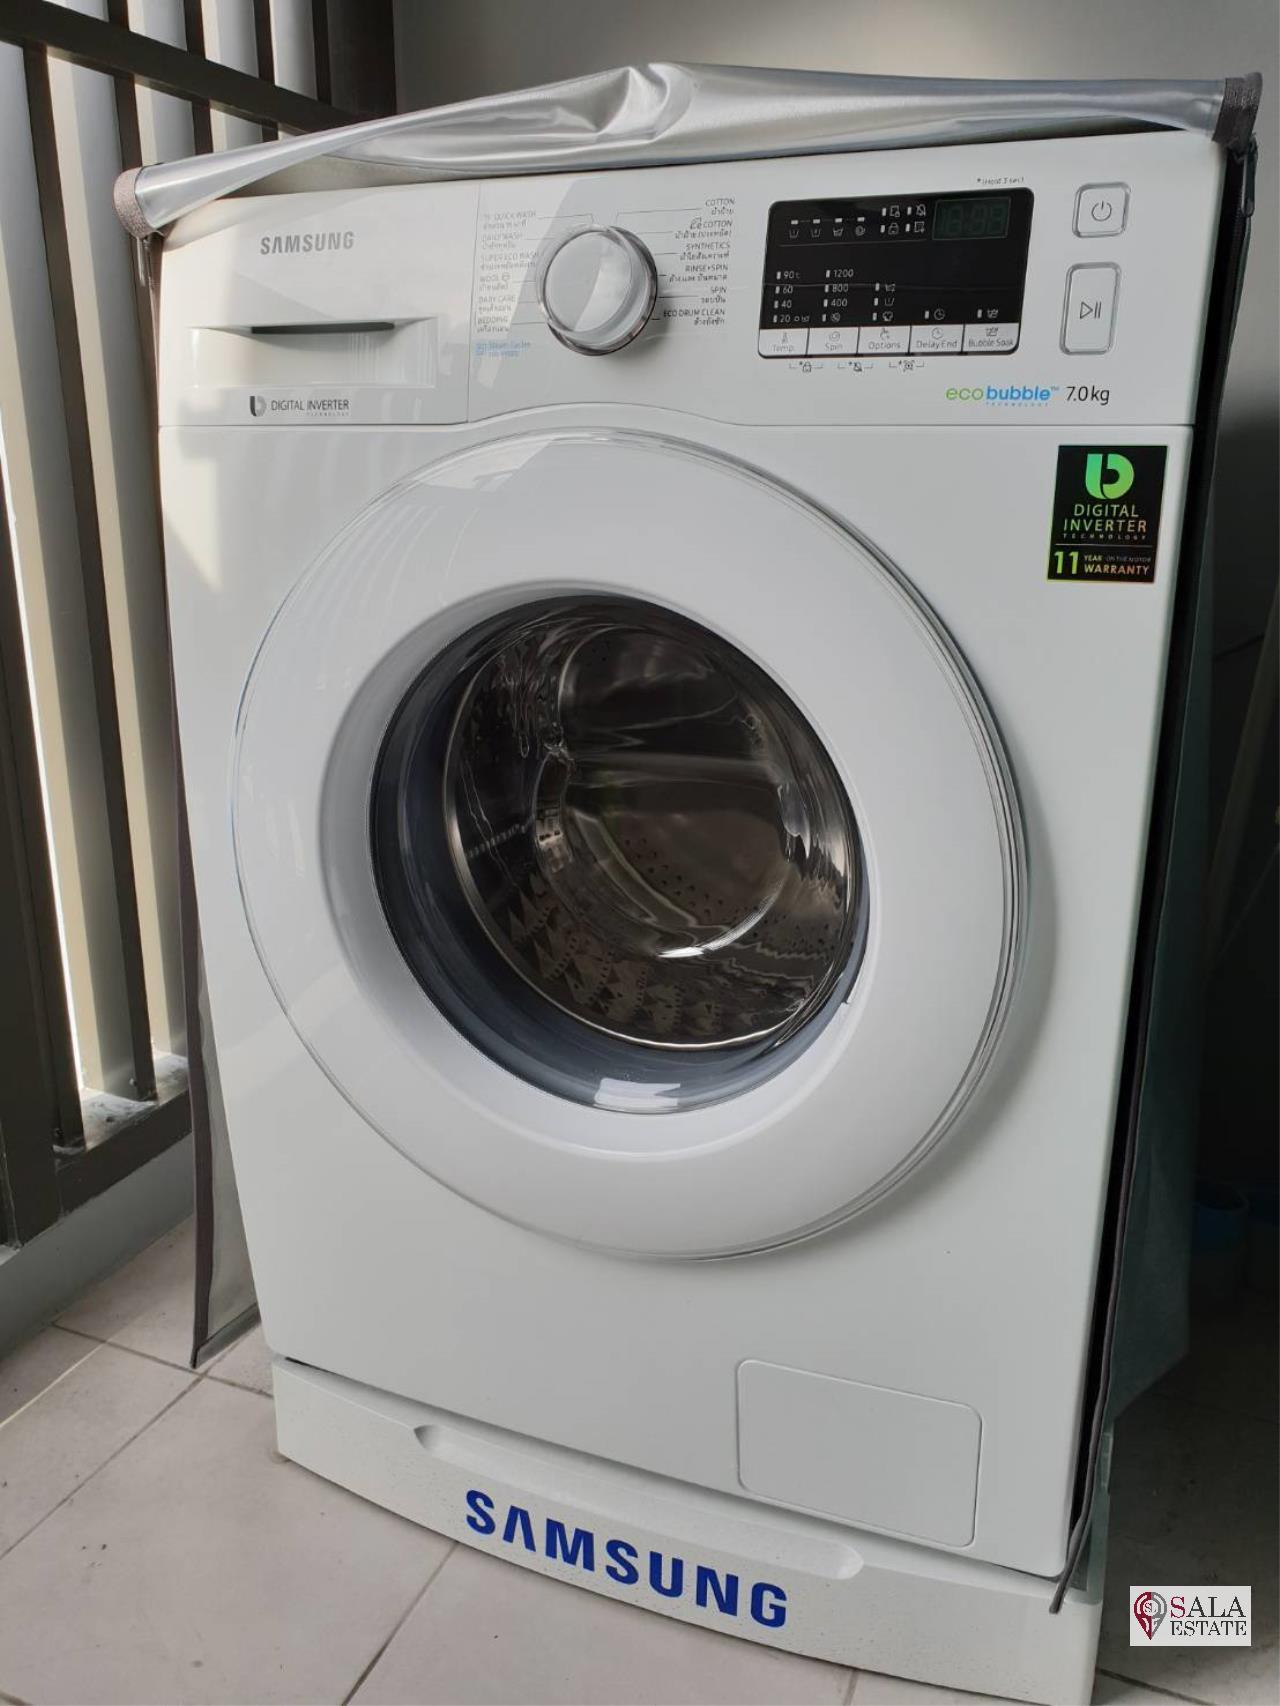 SALA ESTATE Agency's ( SELL WITH TENANT ) LIFE SUKHUMVIT 48 – BTS PHRA KHANONG, 1 BEDROOM  BATHROOM 11